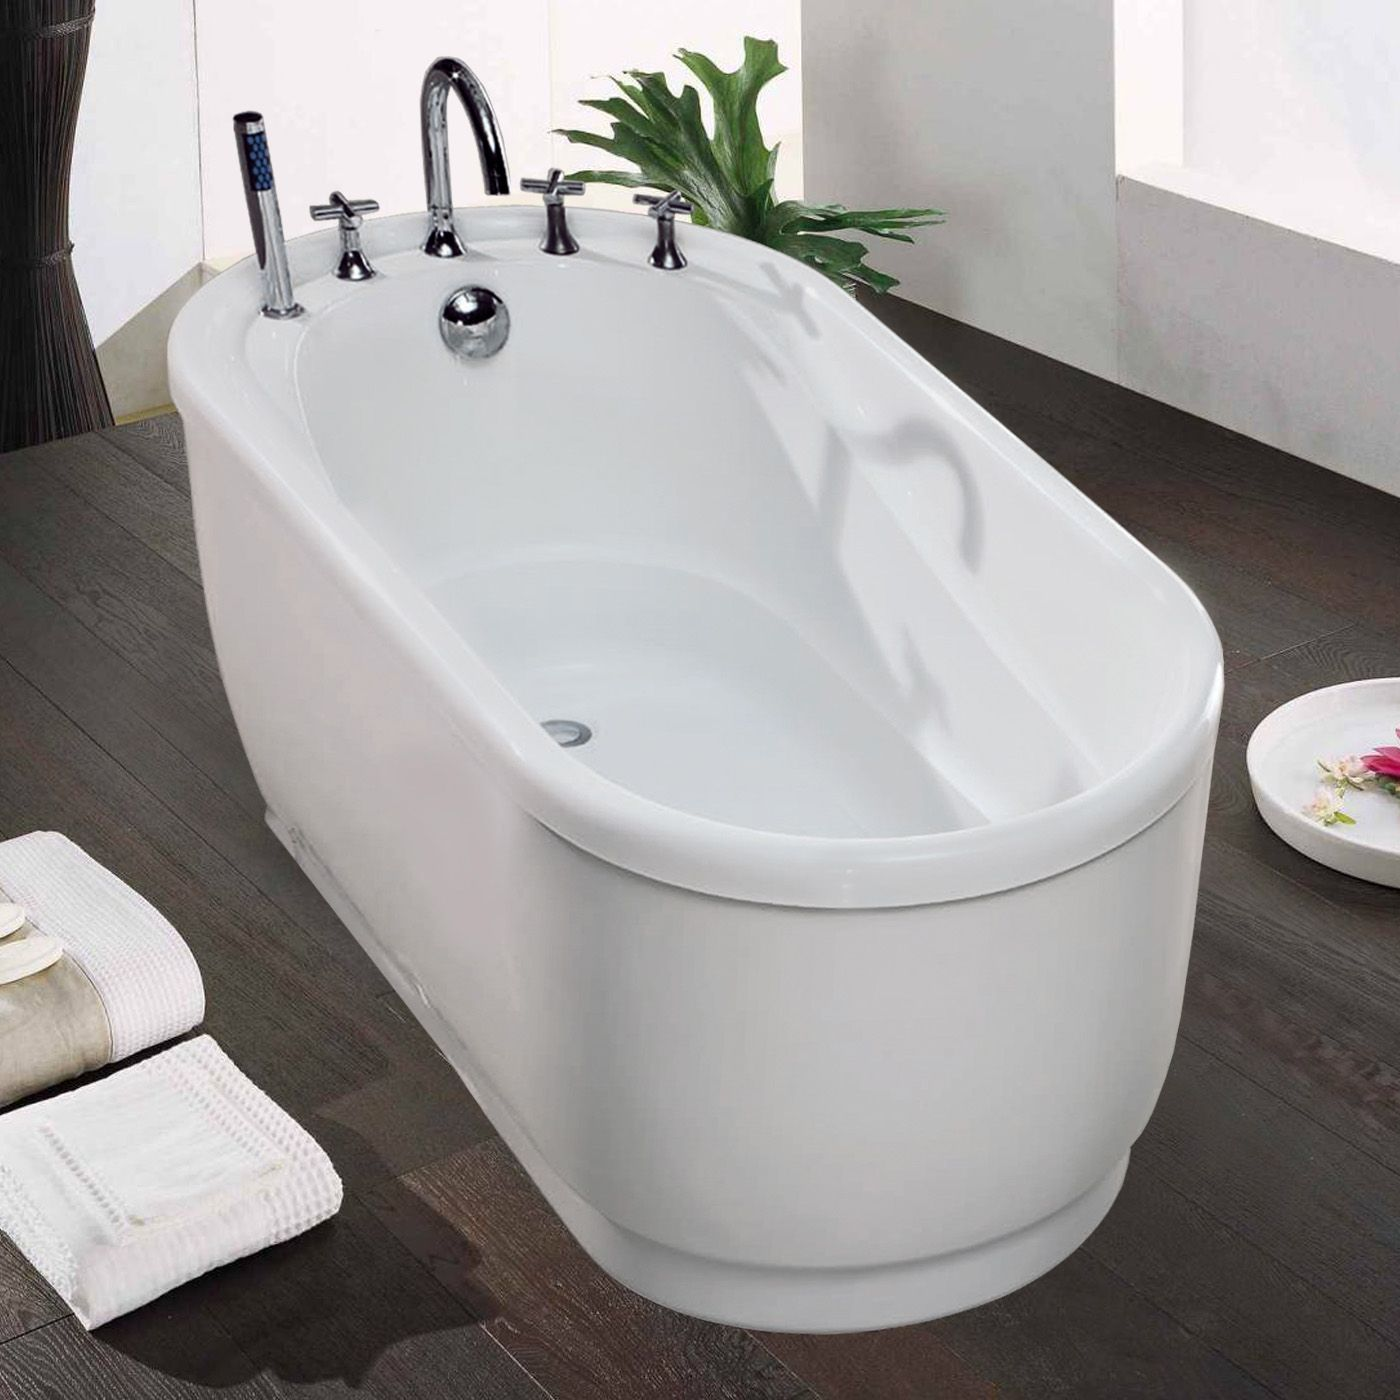 bathtub care never use abrasives to clean fiberglass and acrylic